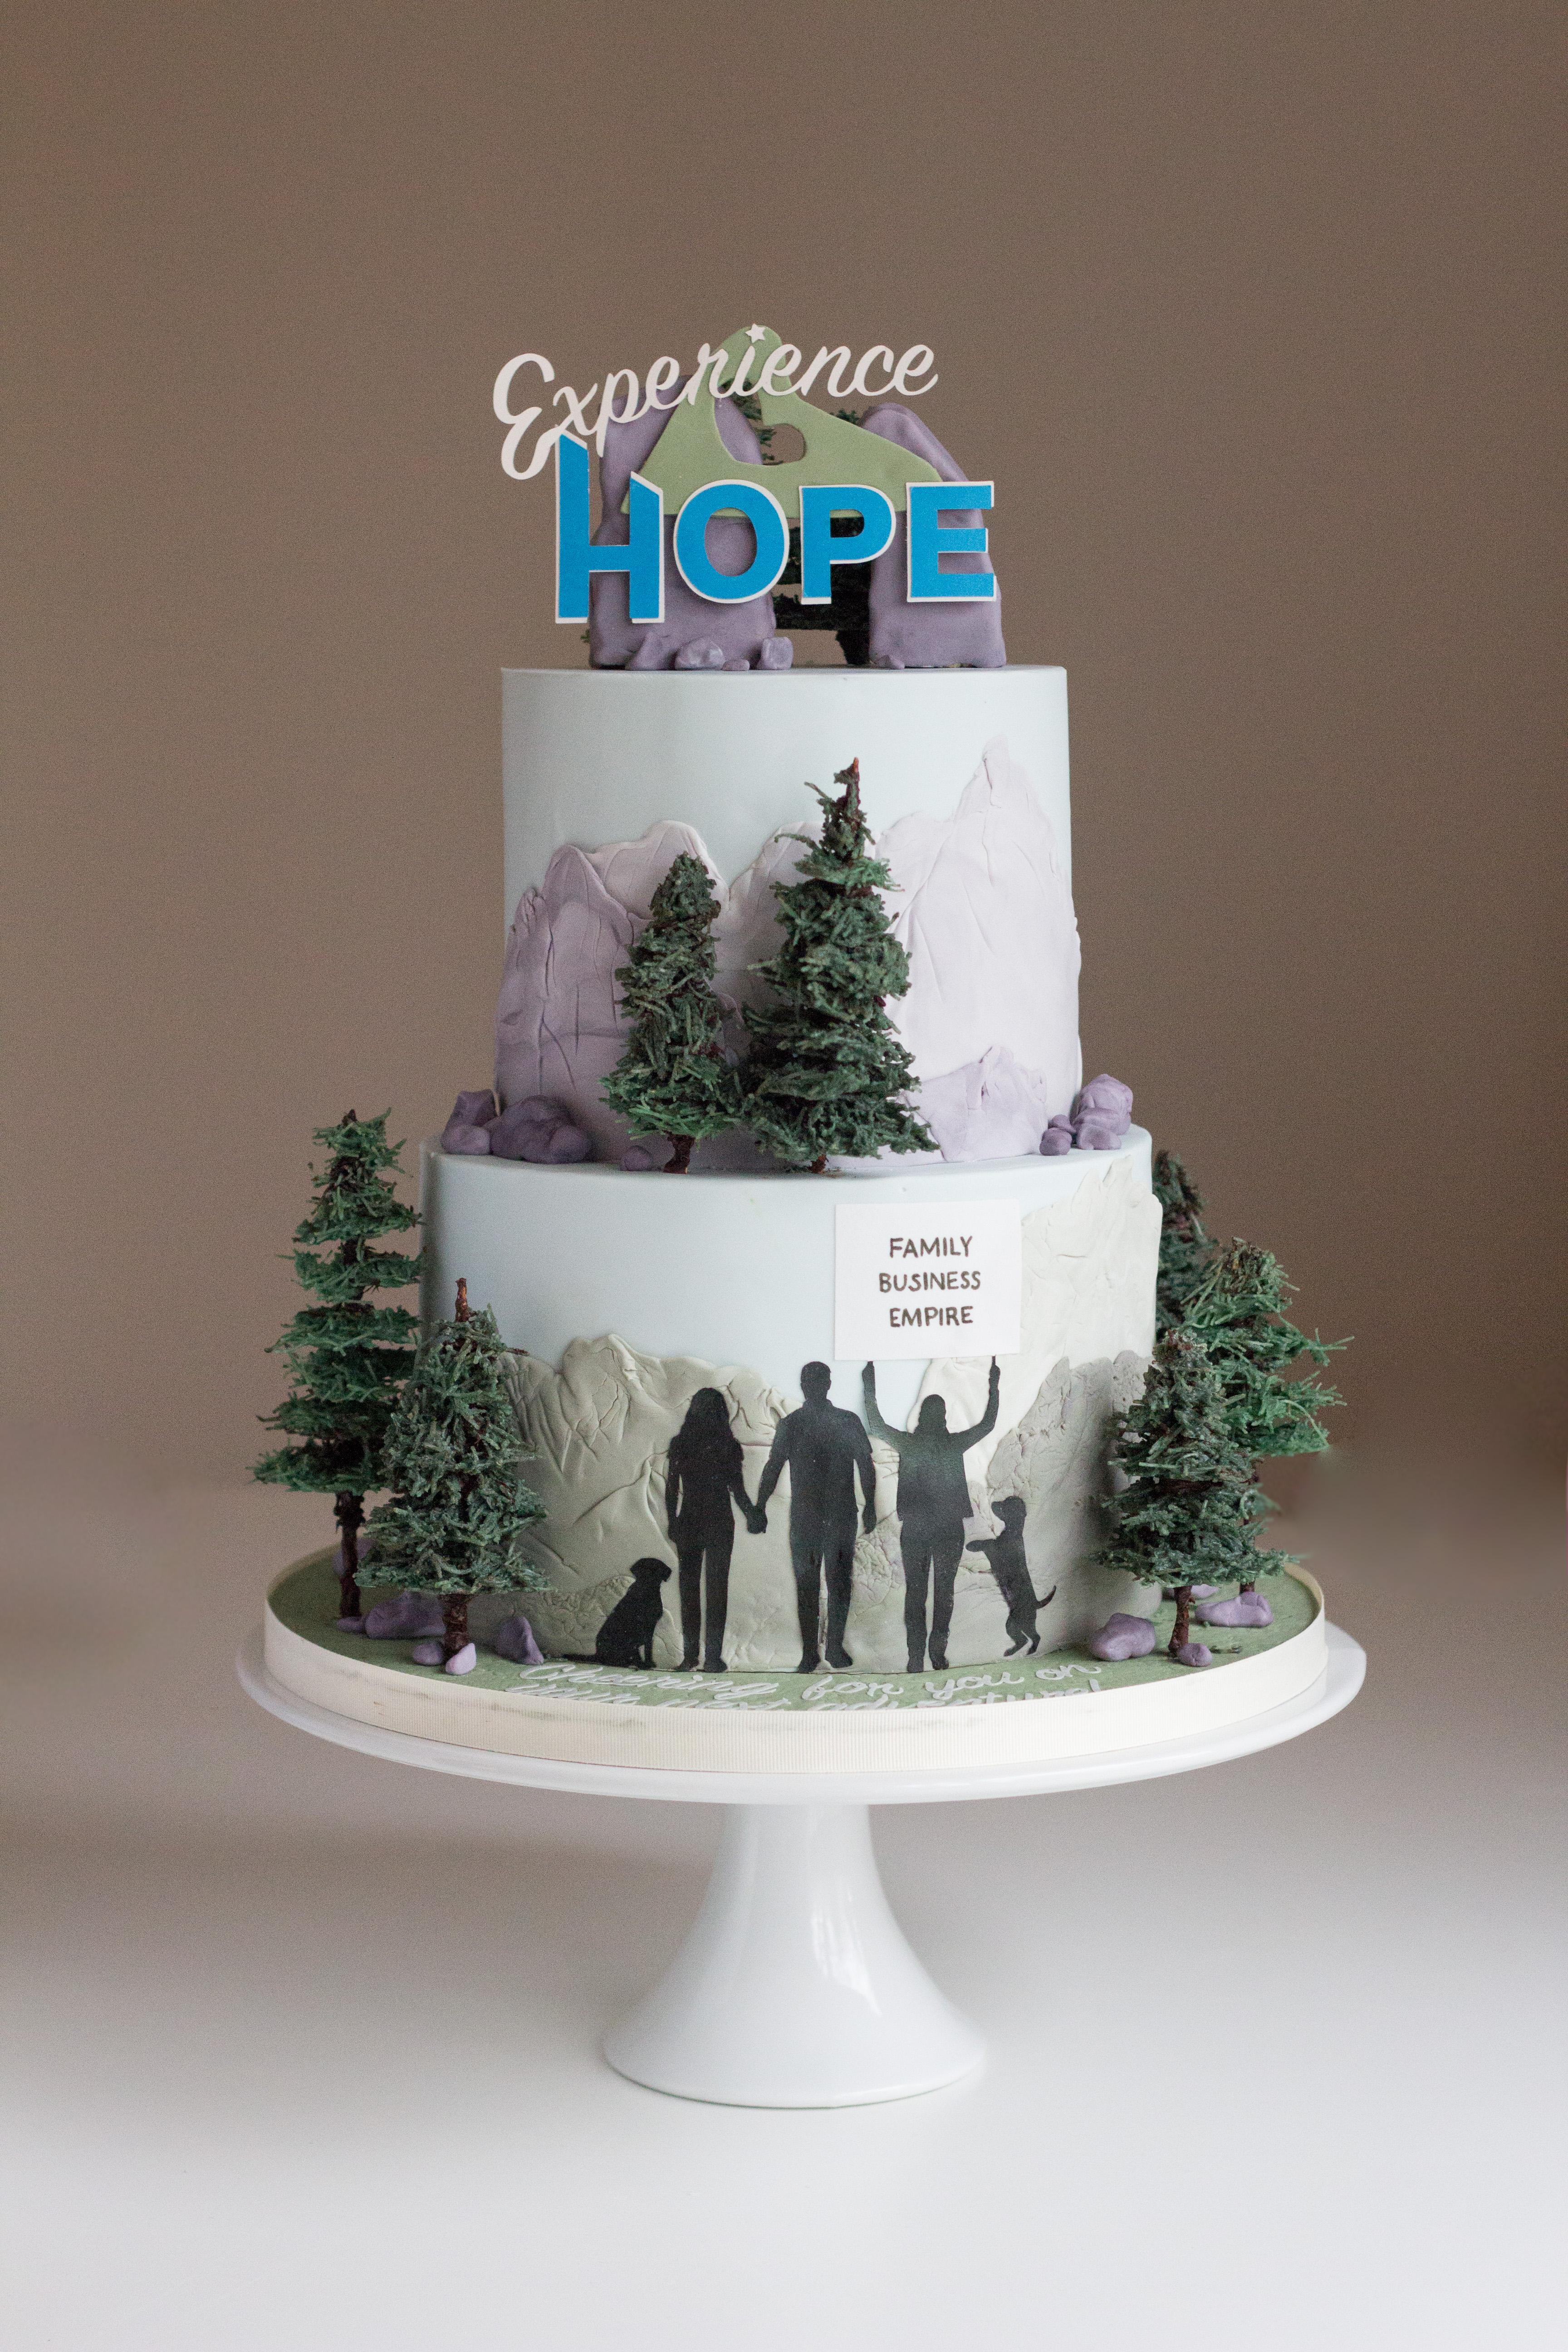 Hope Cake